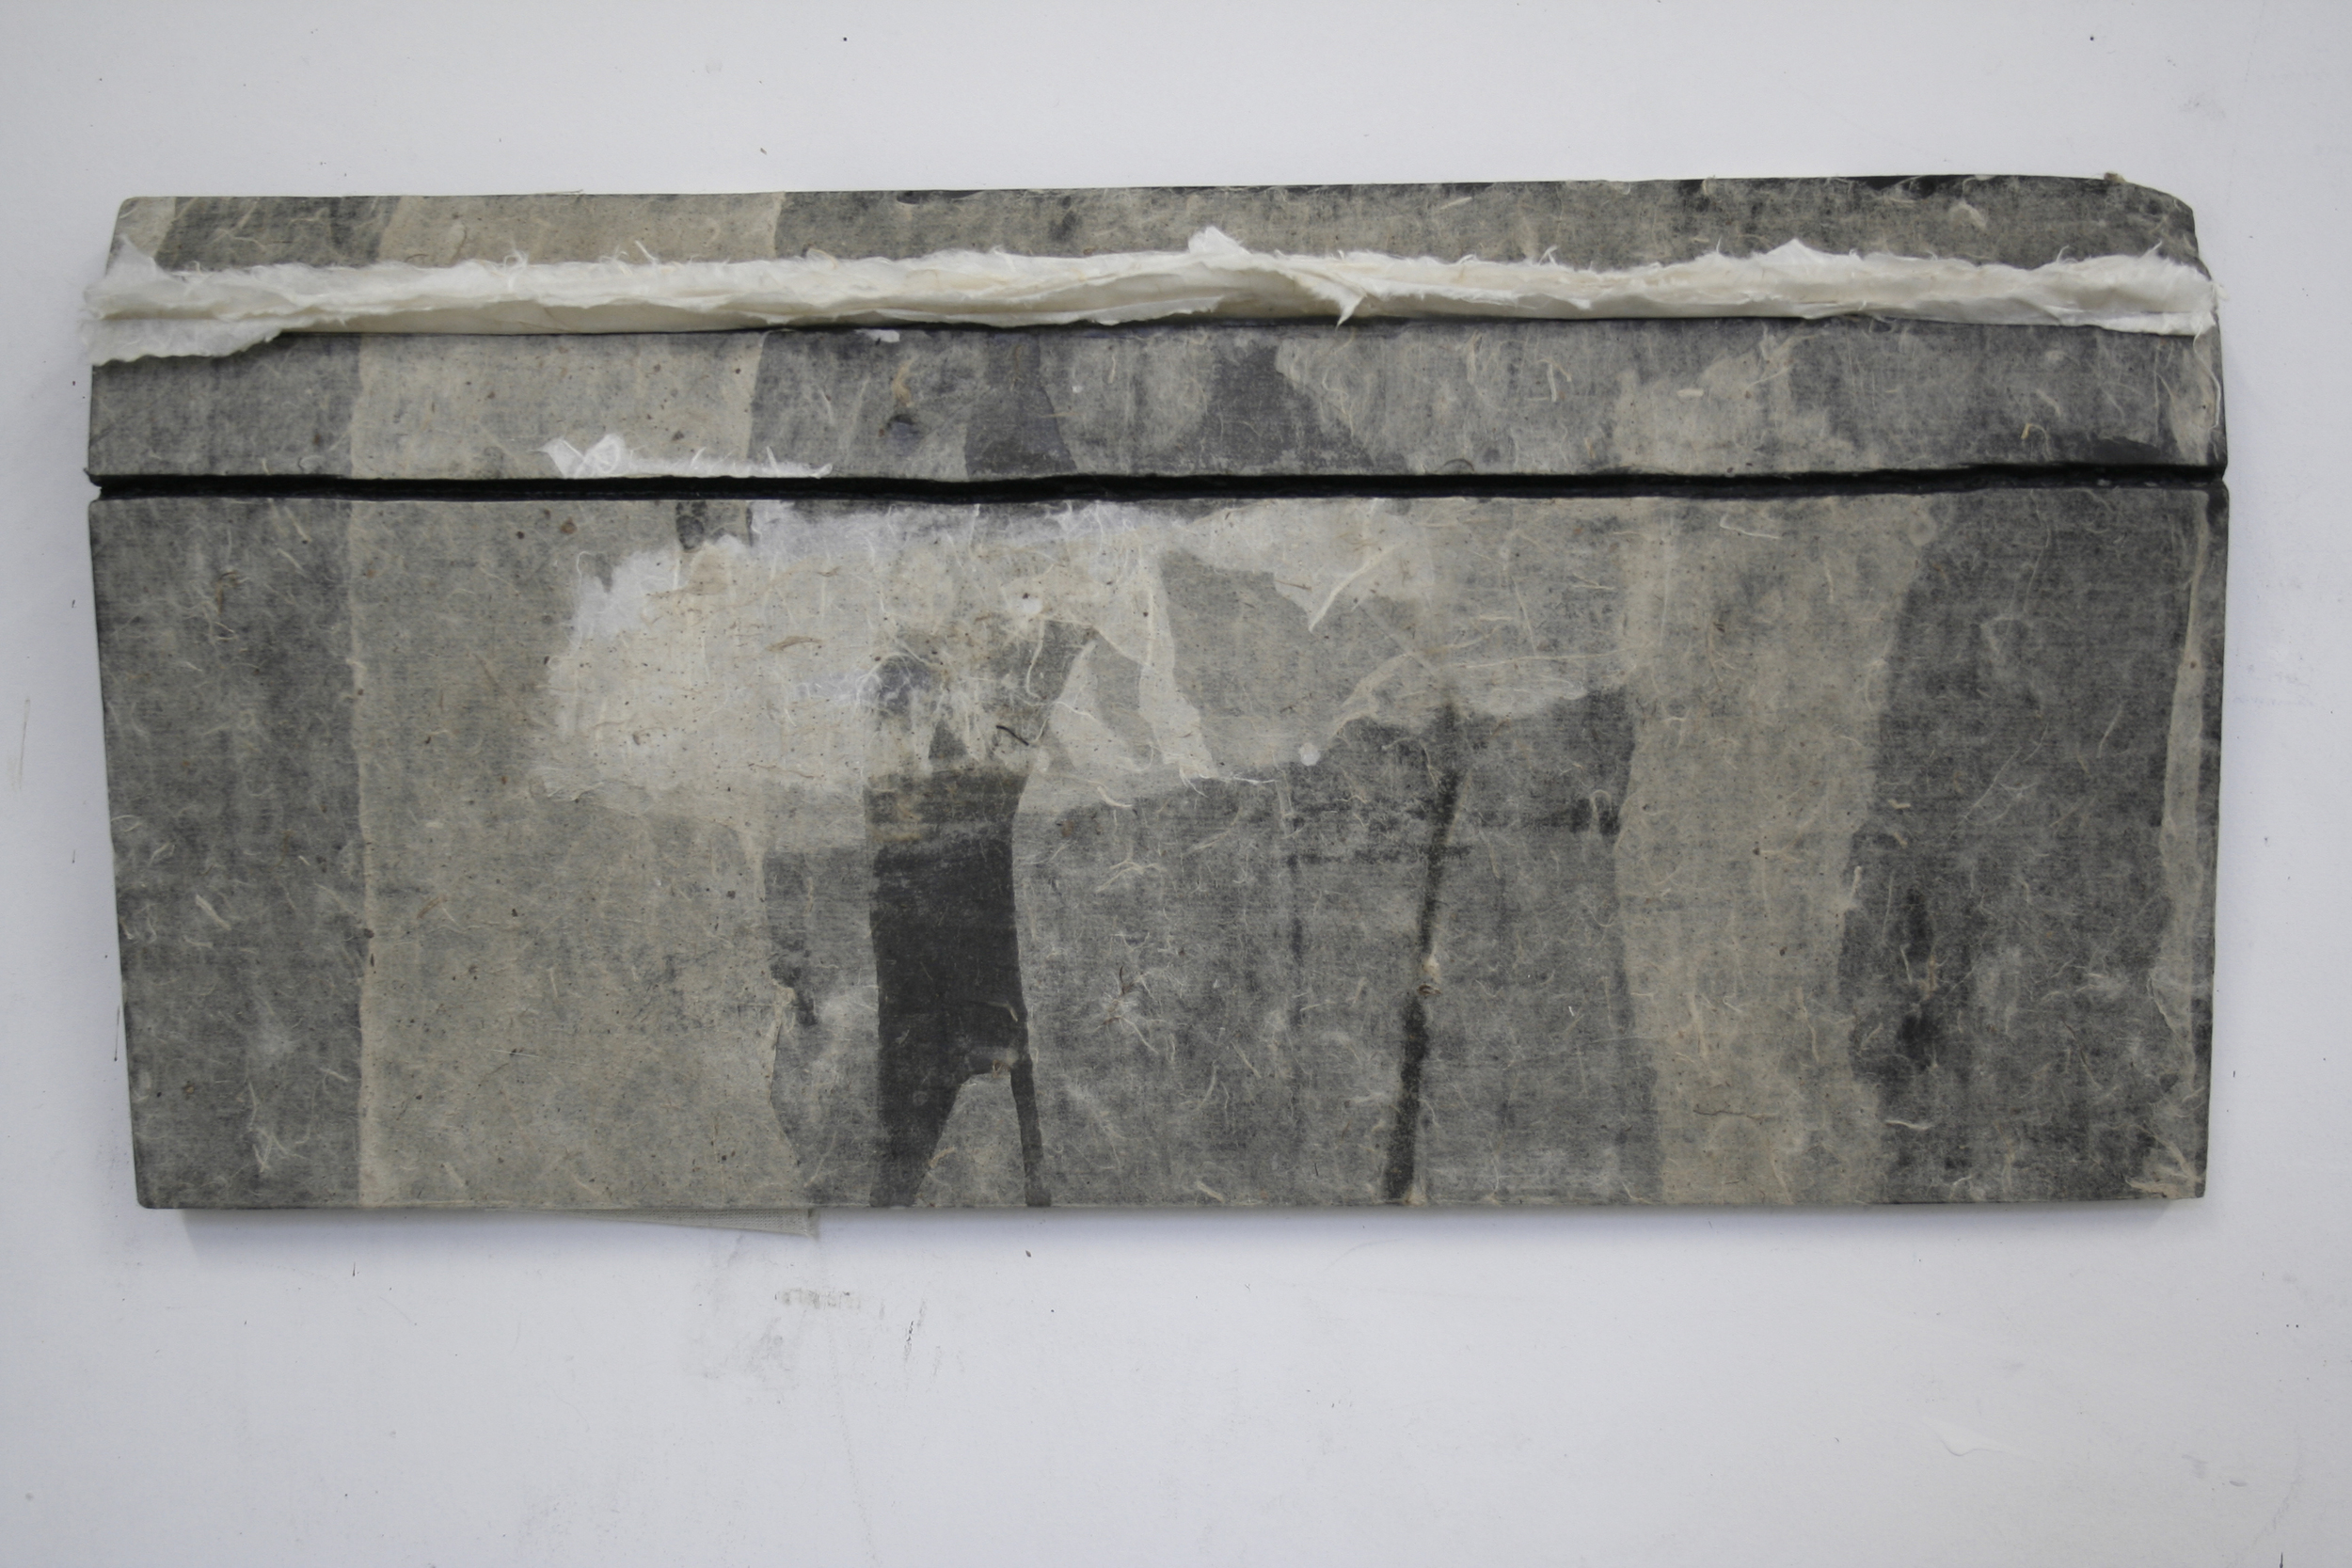 My Street 我的街道, 2013 Ink, wax and Xuan paper 墨、蜡和宣纸 10 x 22 x 2 in